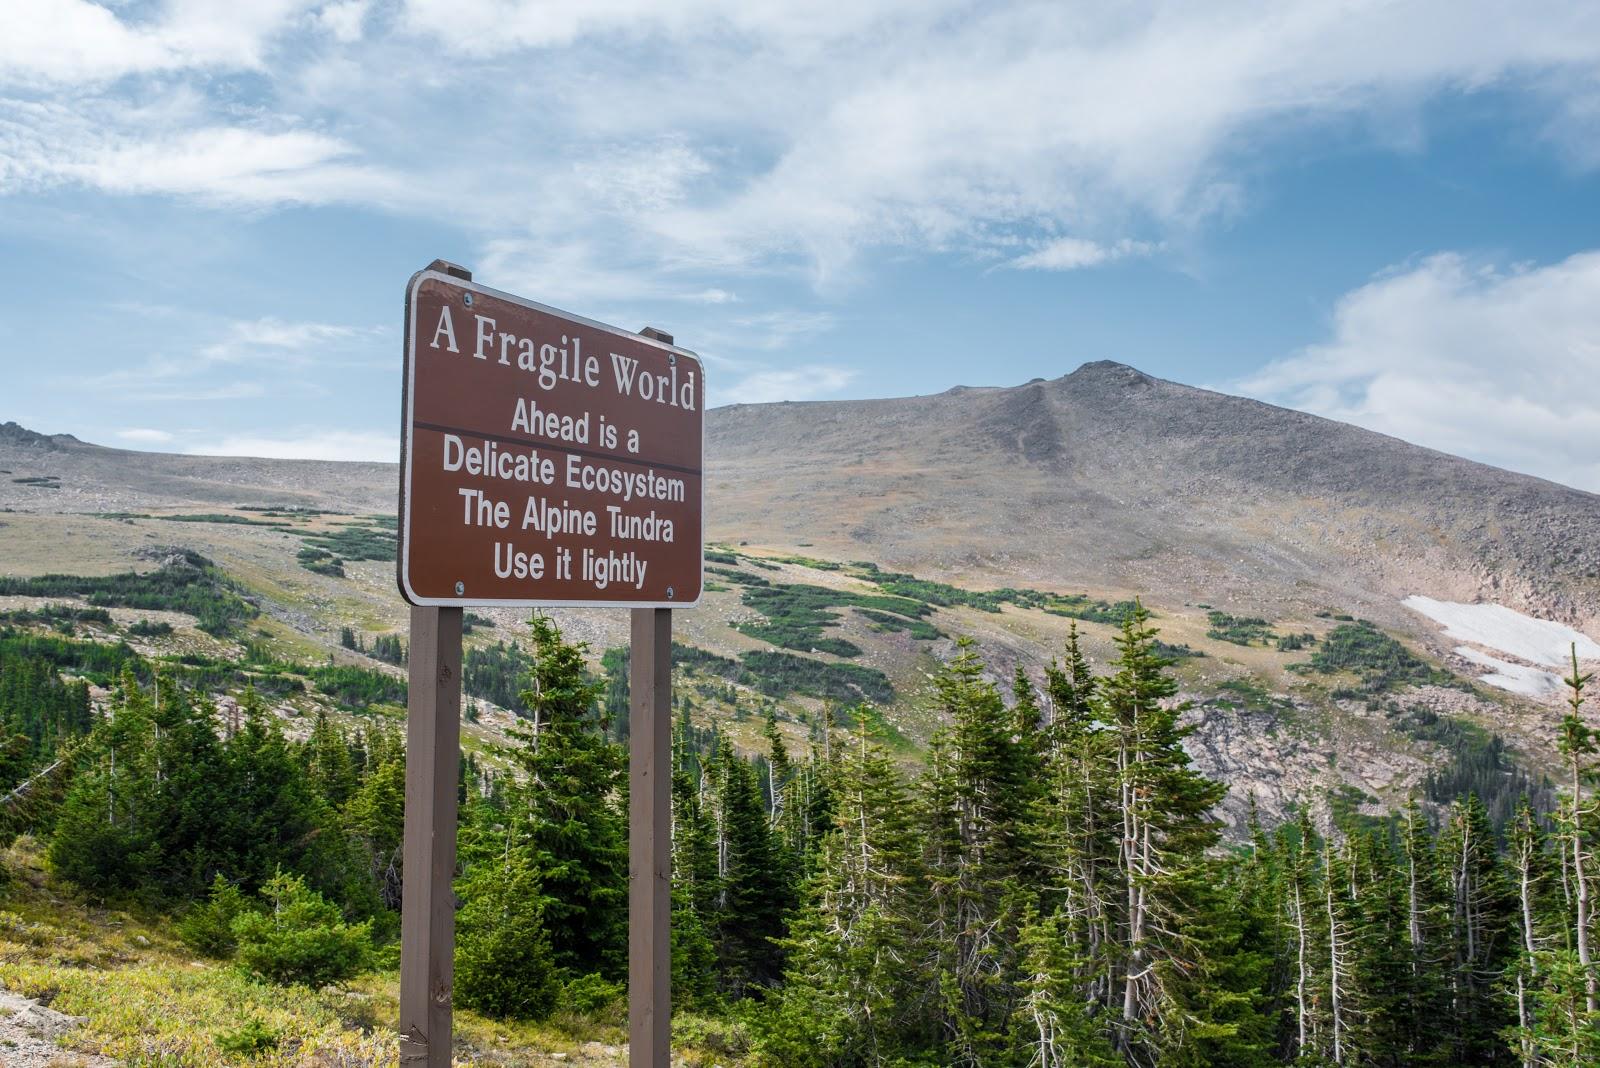 Fragile World sign on bike climb up Trail Ridge